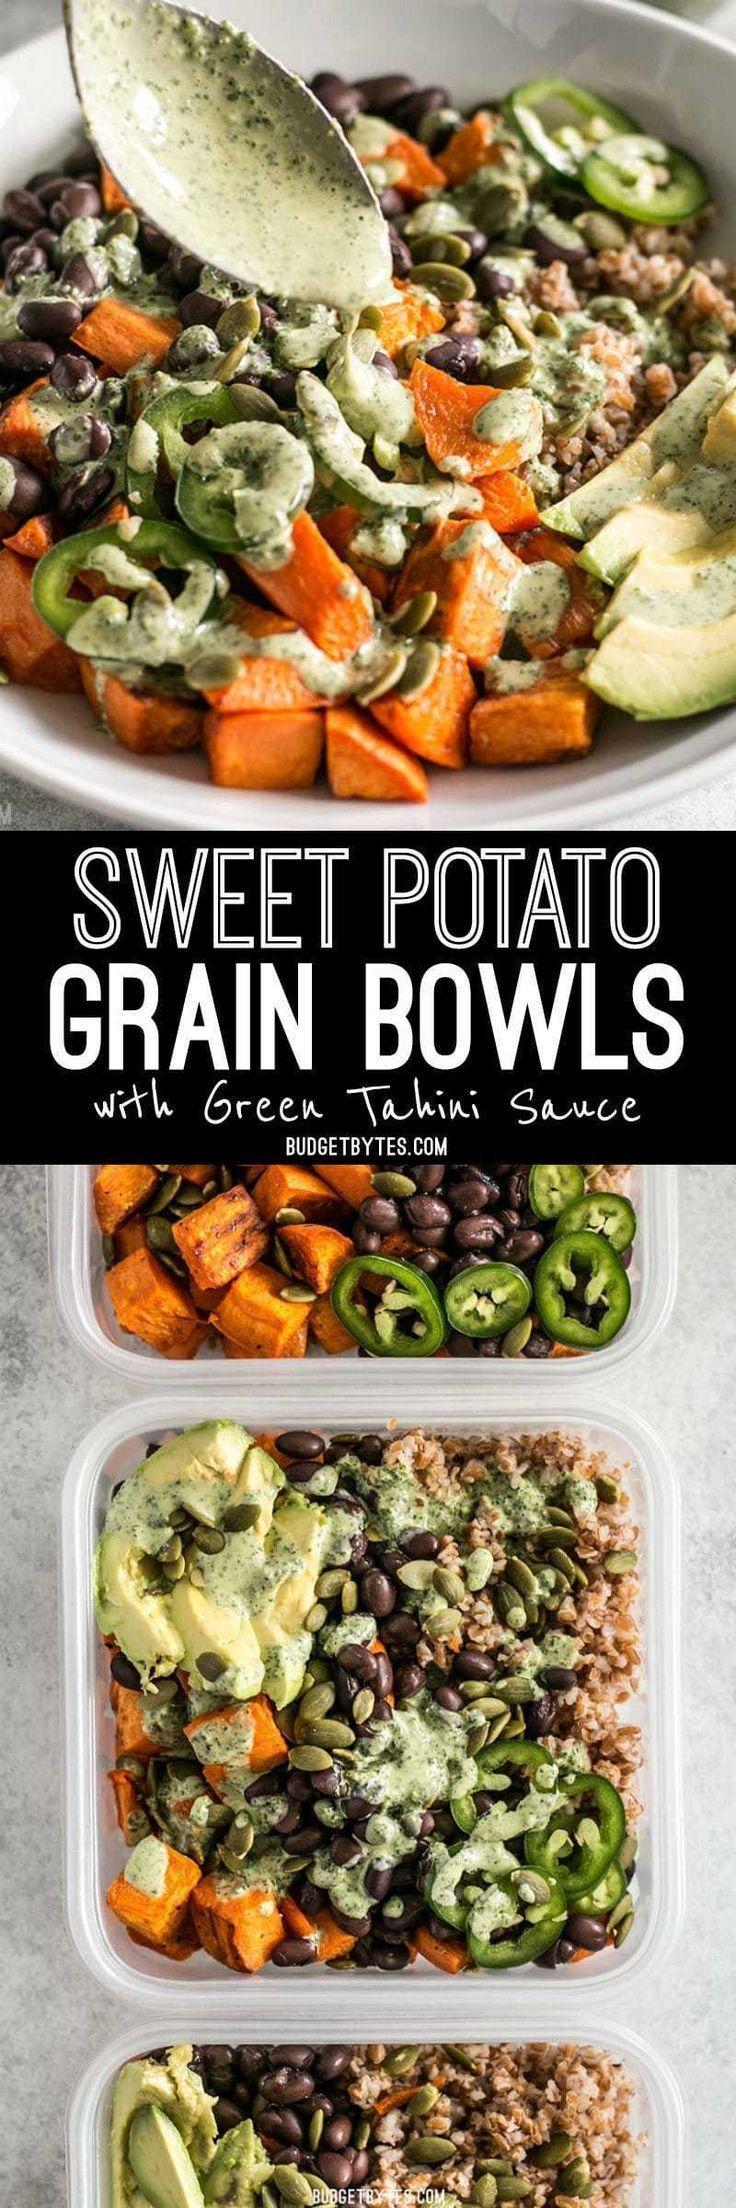 Bowls with Green Tahini Sauce   Sweet Potato Grain Bowls with Green Tahini Sauce  Sweet Potato Grain Bowls with Green Tahini Sauce   Sweet Potato Grain Bowls with Green T...